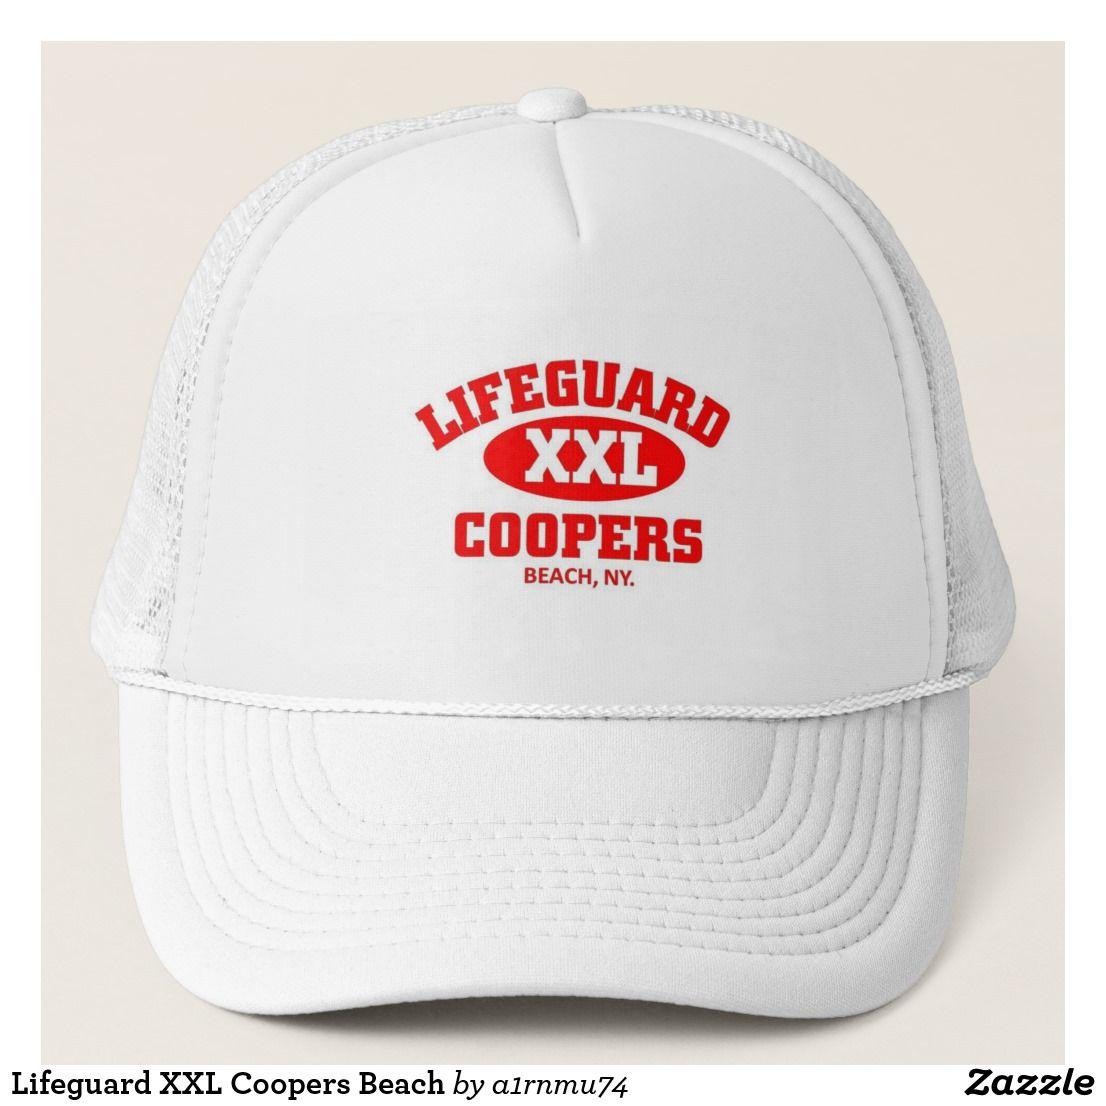 Lifeguard XXL Coopers Beach Trucker Hat   Zazzle com   Caps